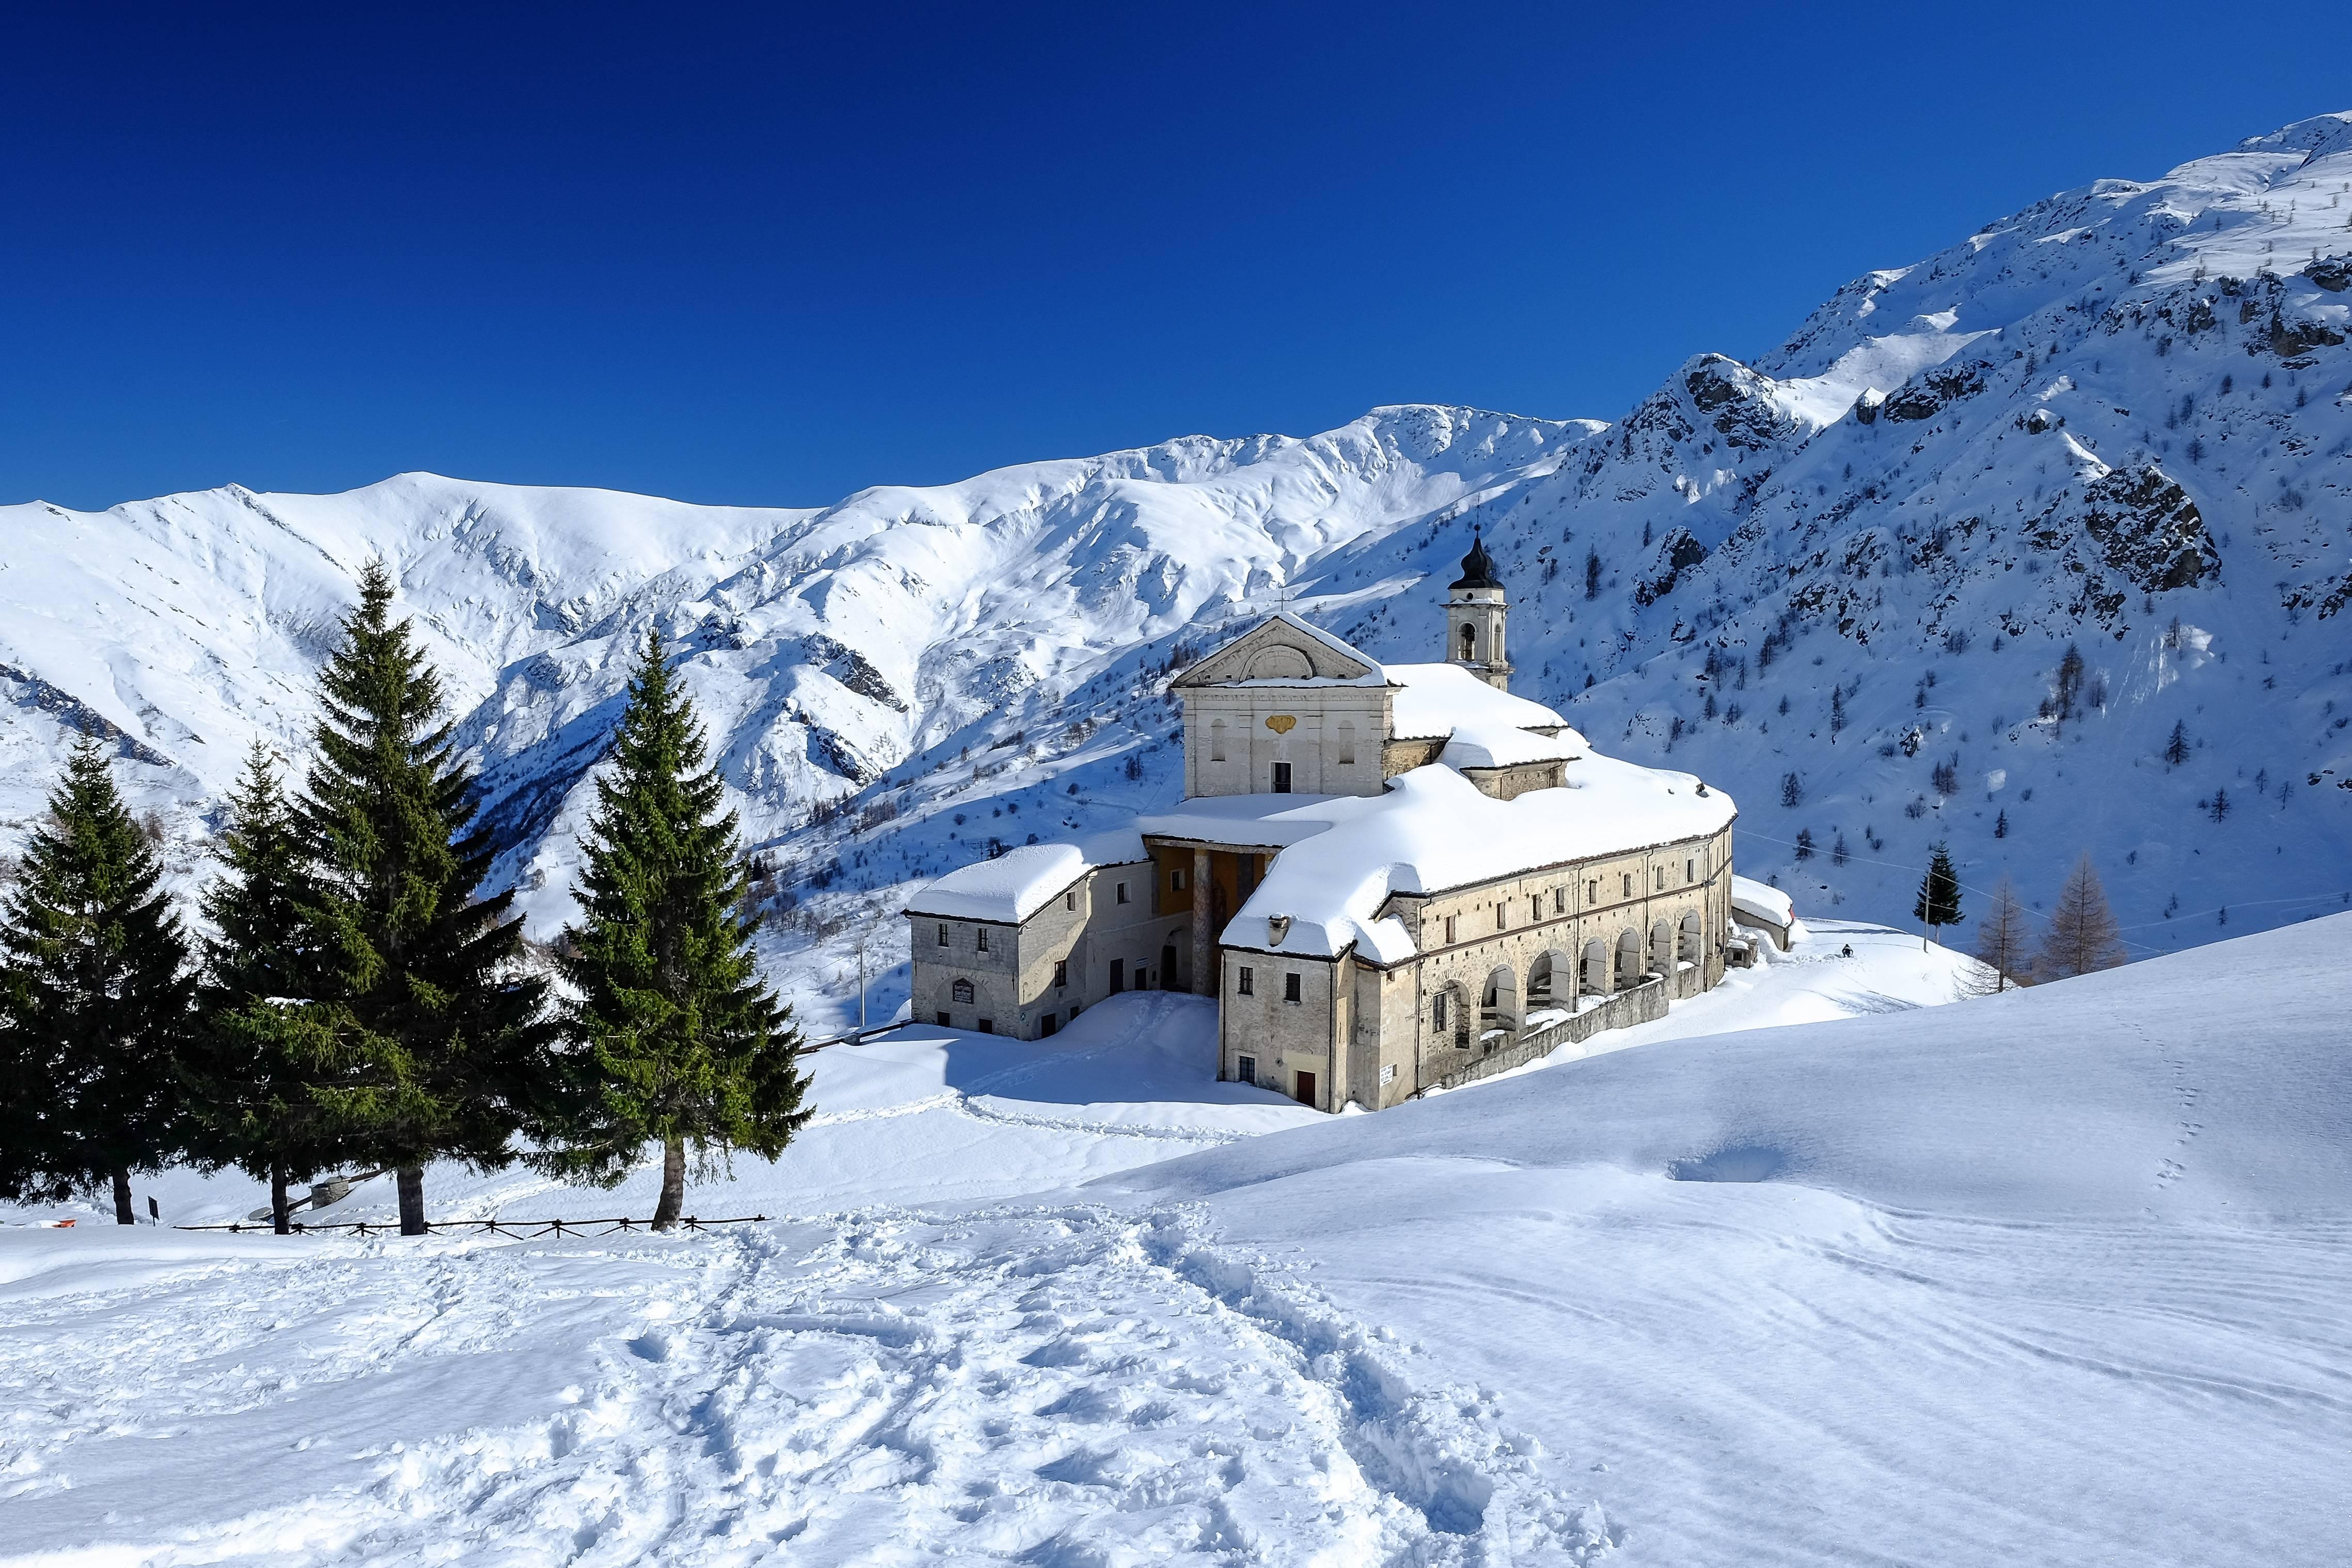 обои Castelmagno, Пьемонт, Италия, горы картинки фото